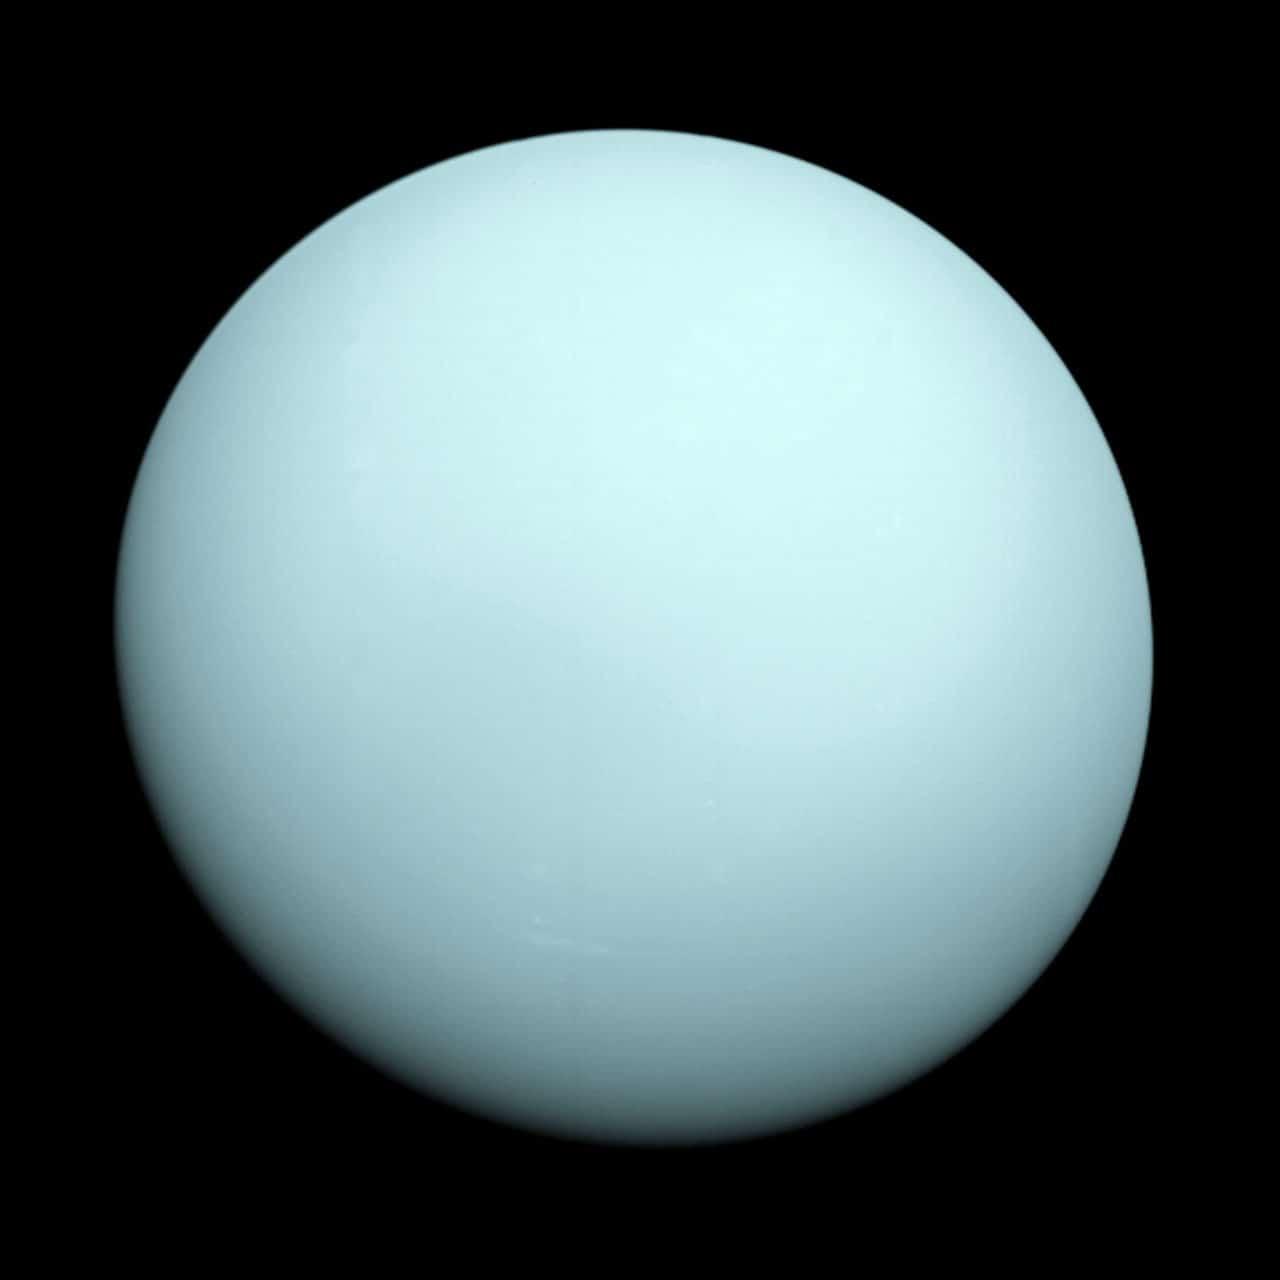 According to NASA: Uranus is leaking gas